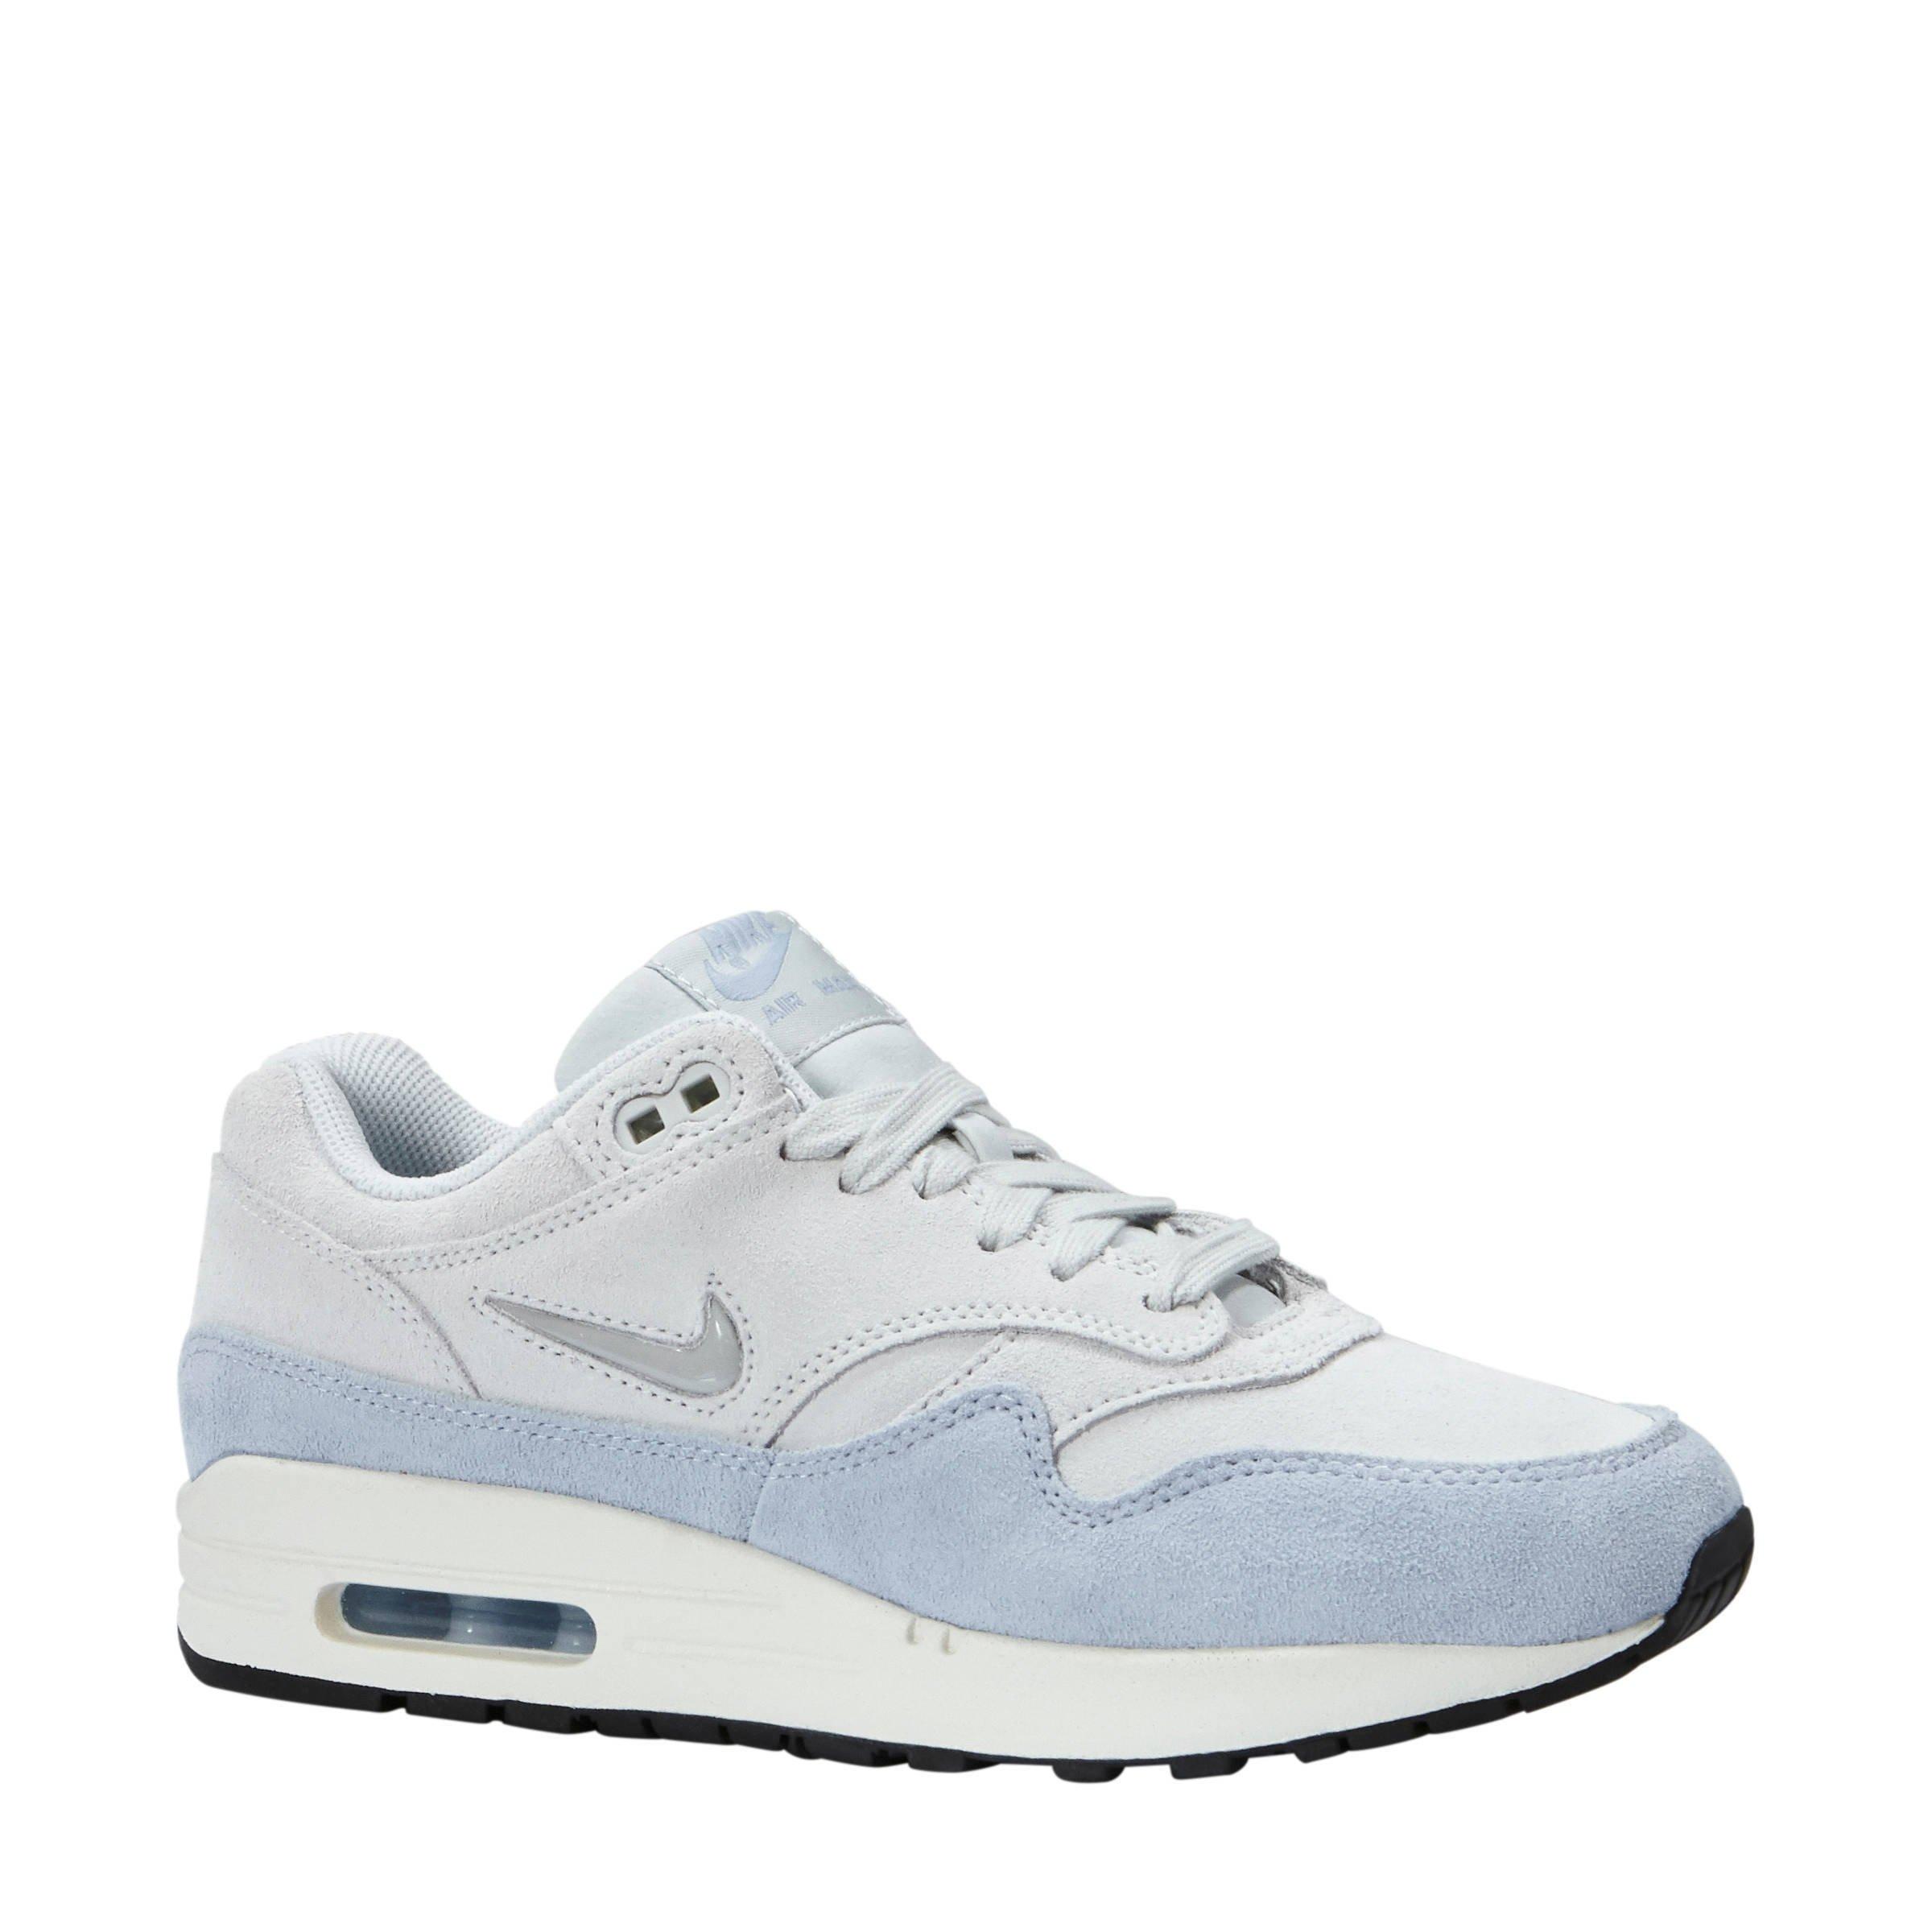 Nike Air Max 1 Premium sneakers gebroken wit/lichtblauw ...